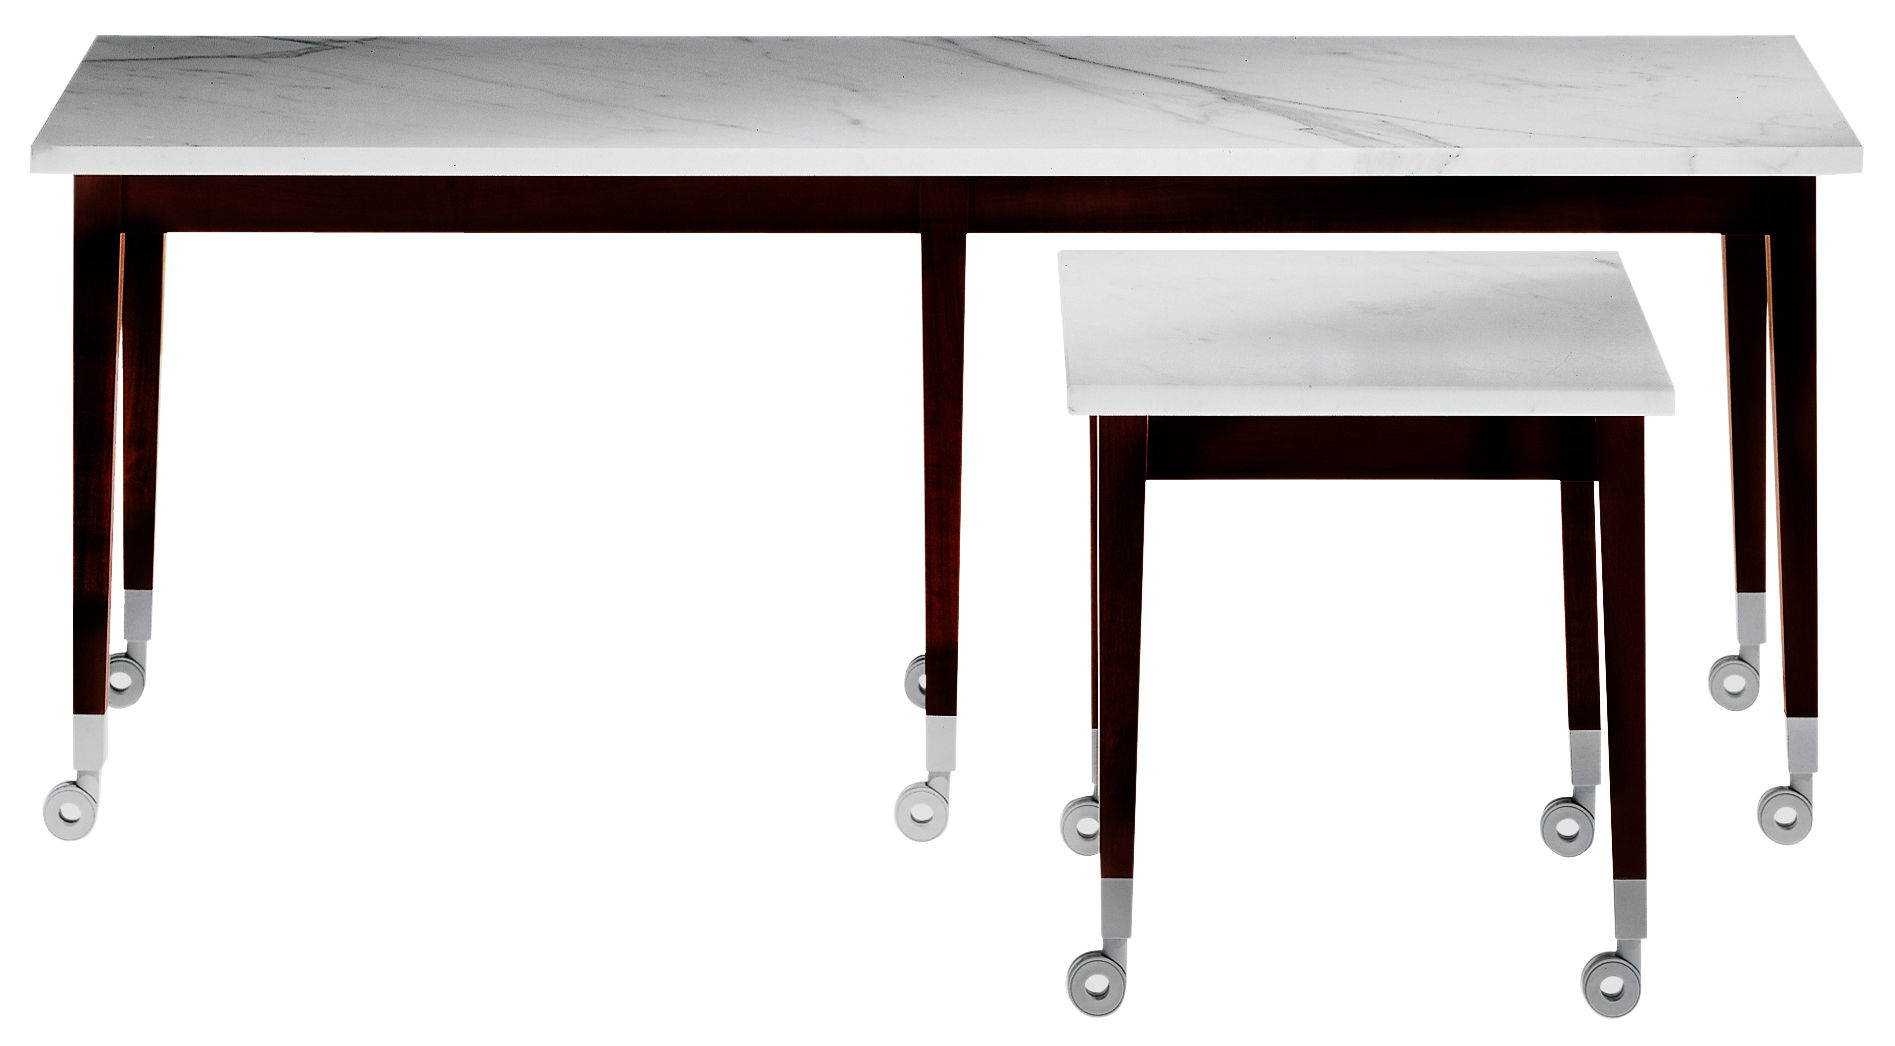 table basse neoz rectangulaire eb ne marbre driade. Black Bedroom Furniture Sets. Home Design Ideas